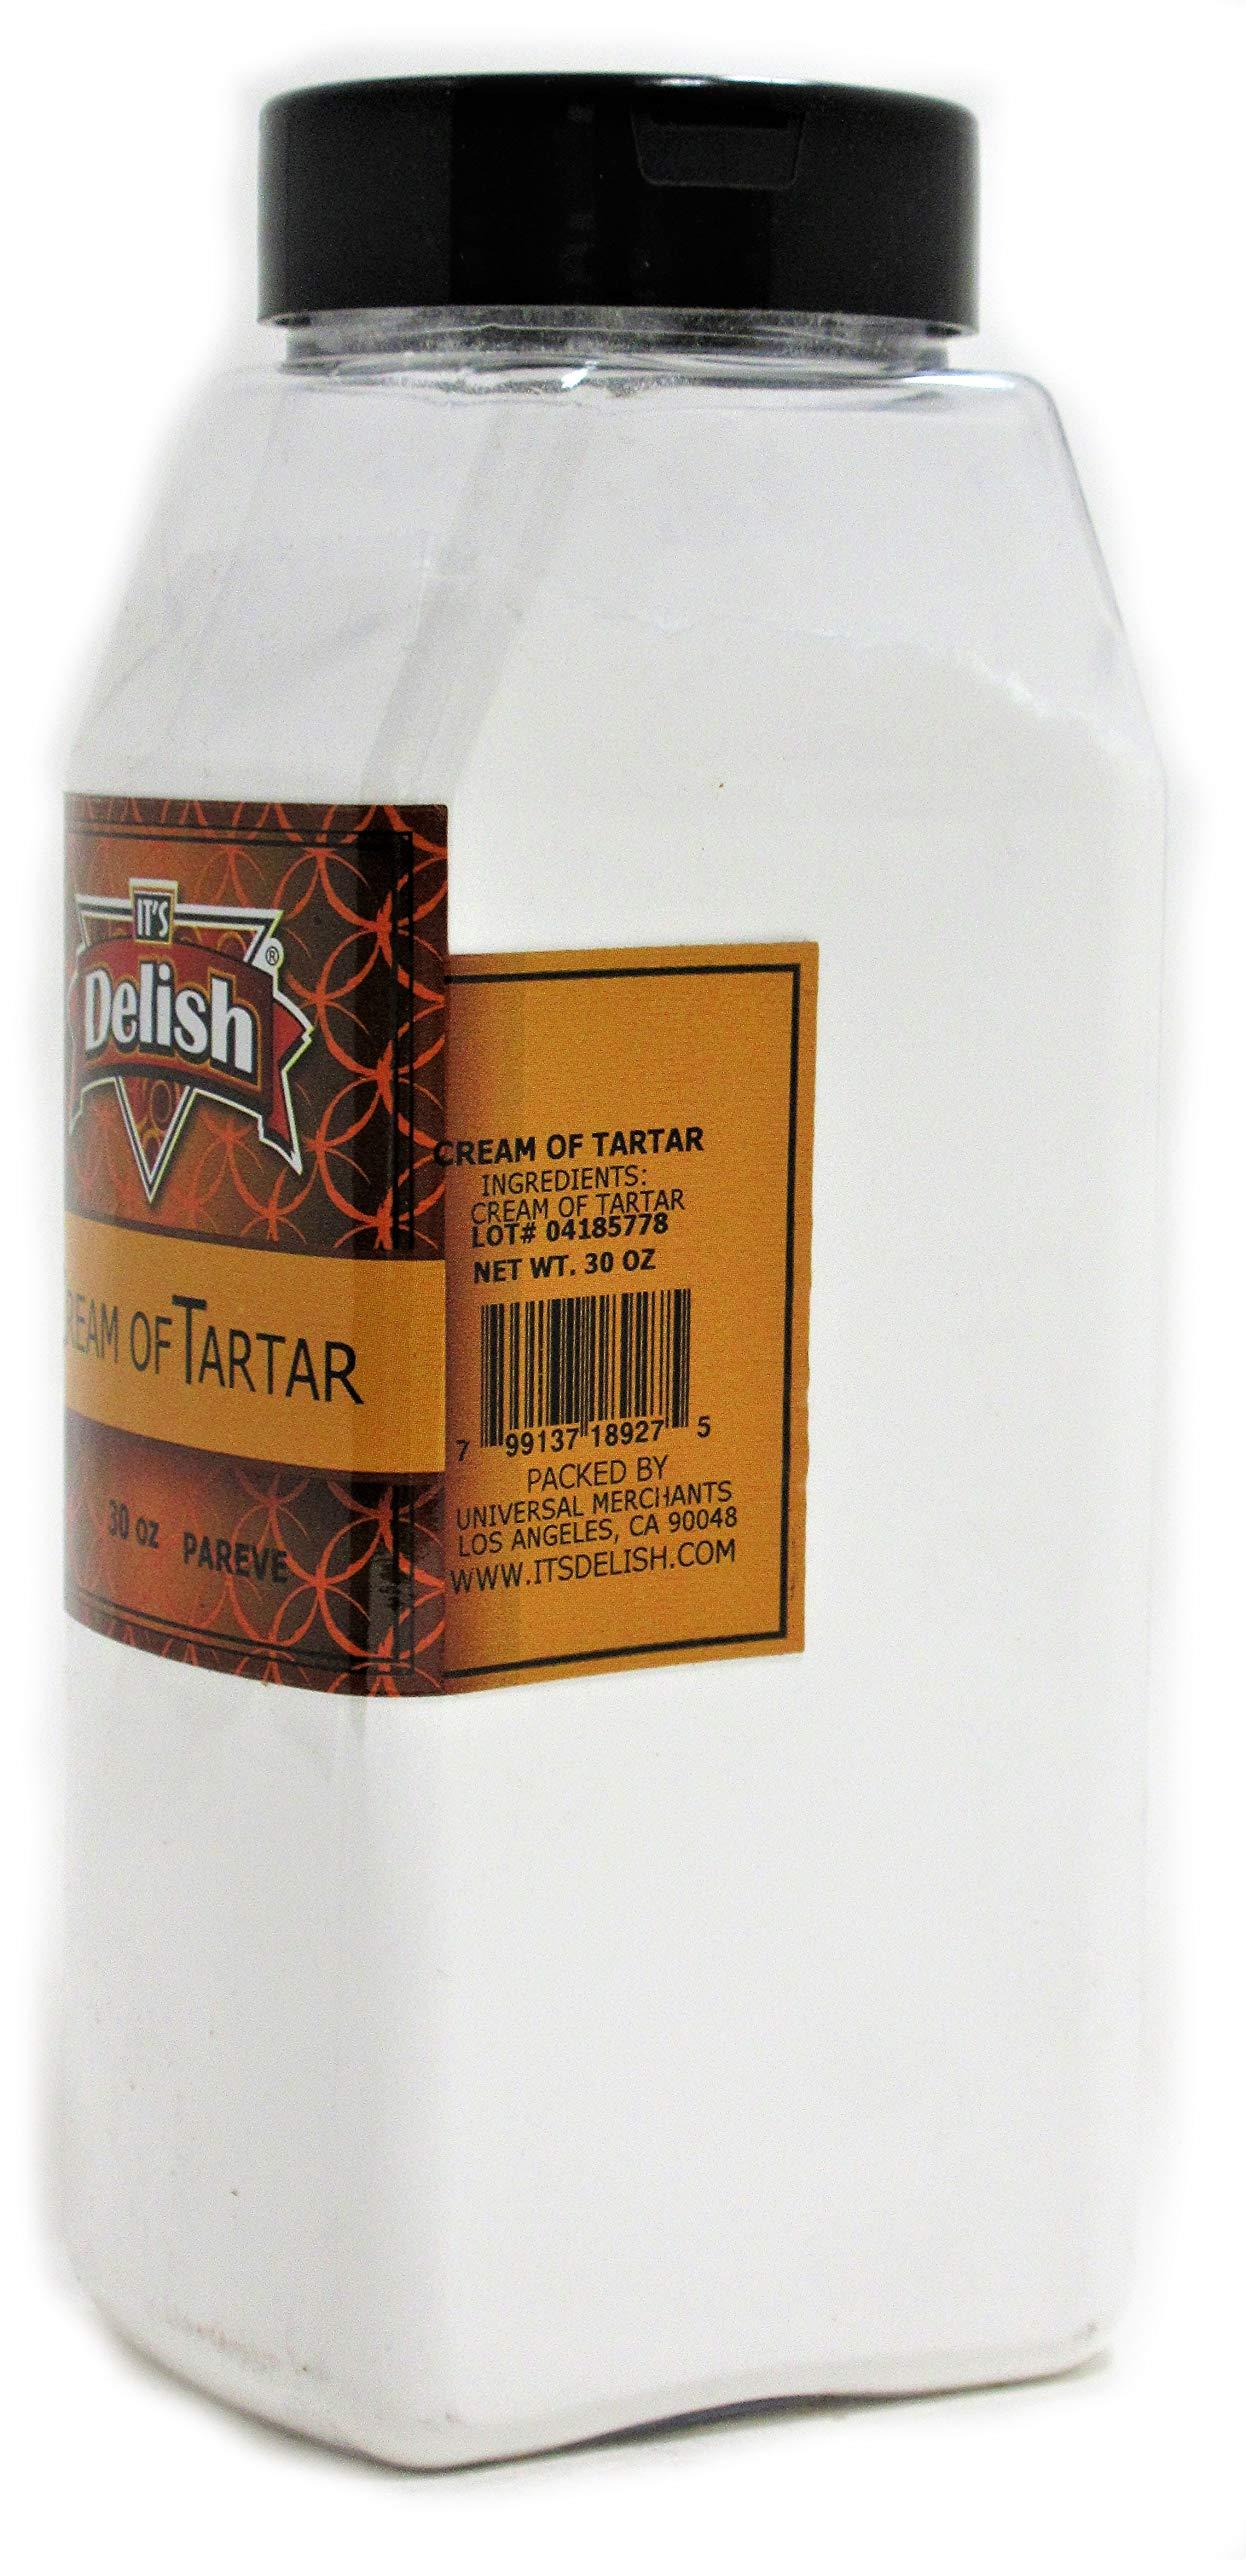 Cream of Tartar by Its Delish, 30 Oz Large Jar by Its Delish (Image #3)